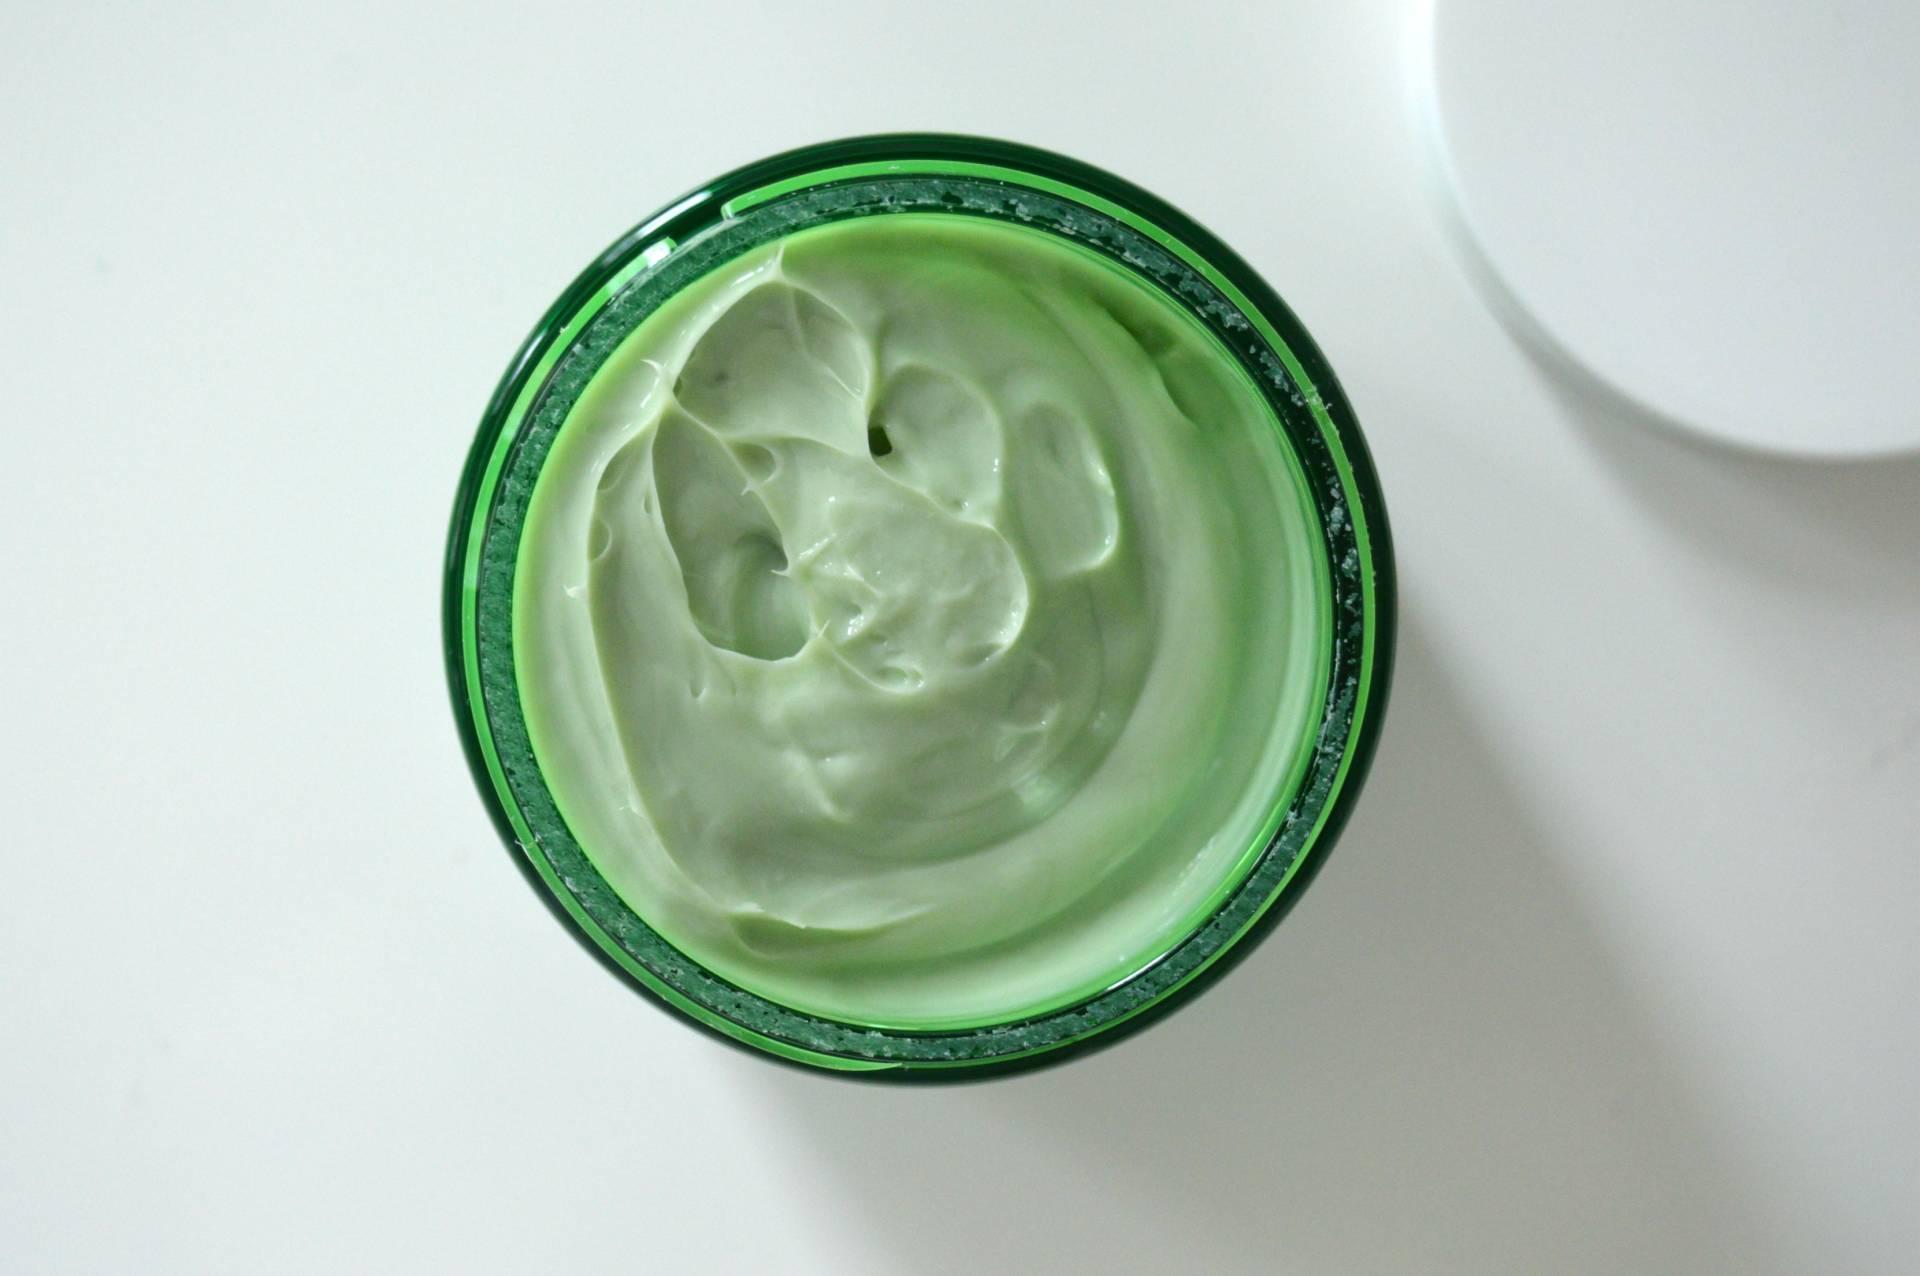 kiehls cilantro orange extract masque review inhautepursuit